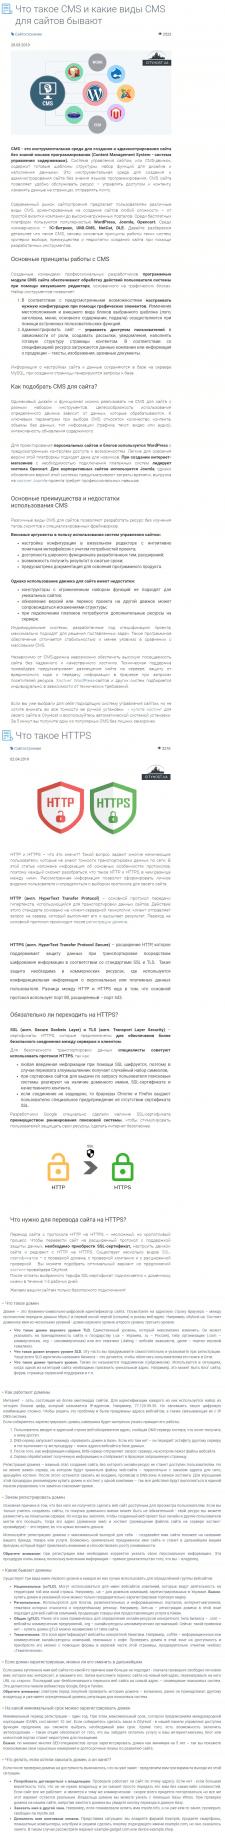 WEB | Хостинг Cityhost.ua